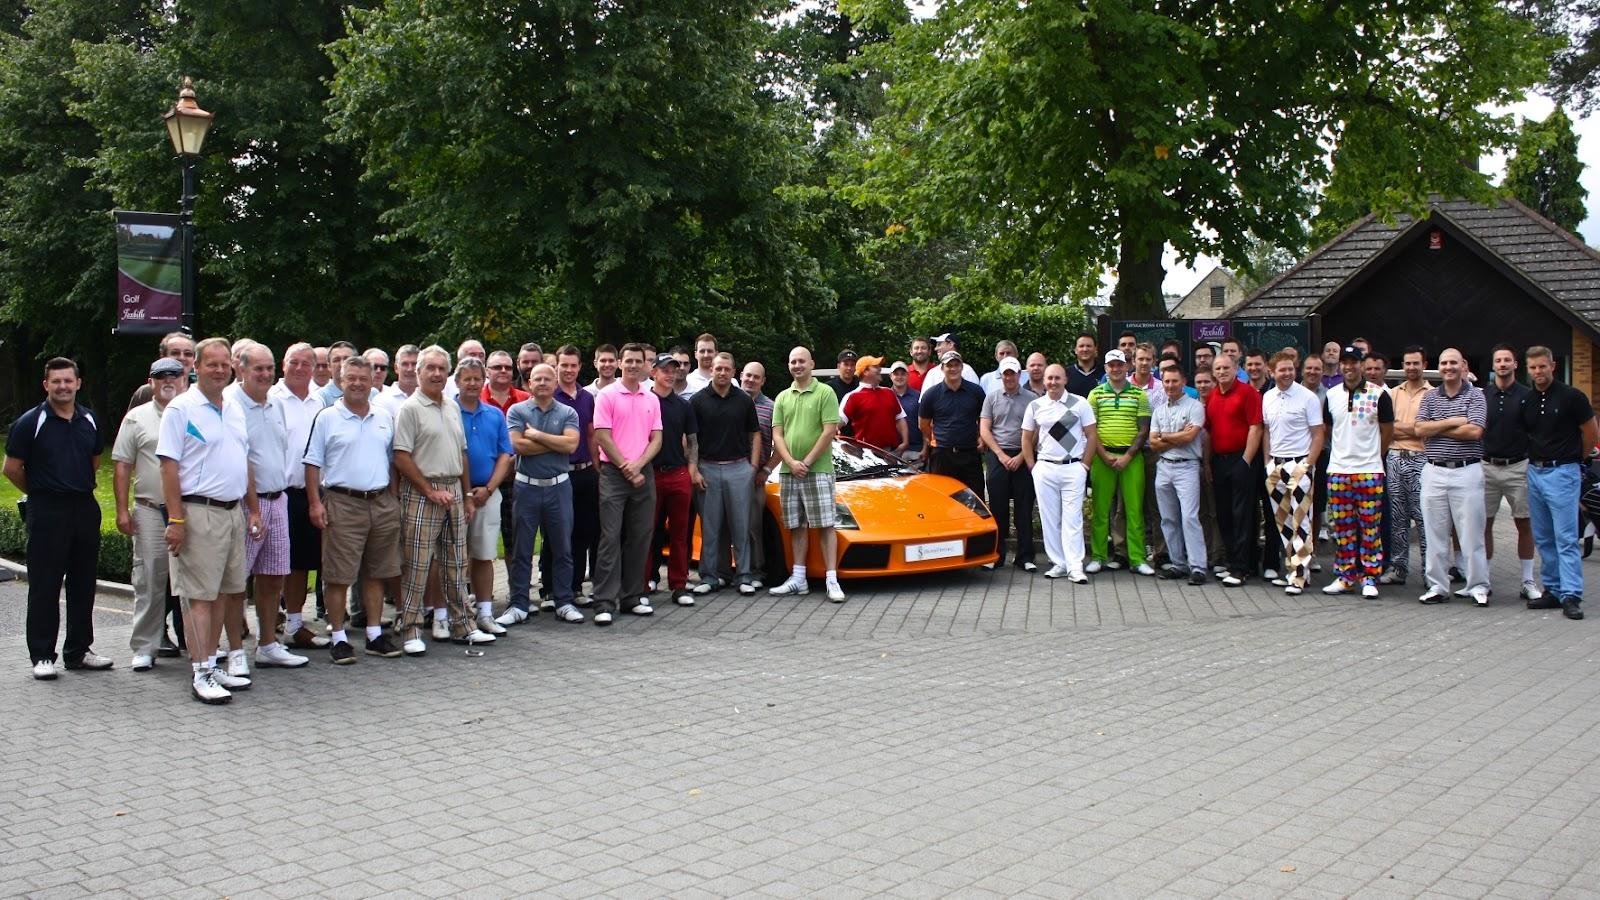 pagani zonda and lamborghini murcielago at charity golf event at